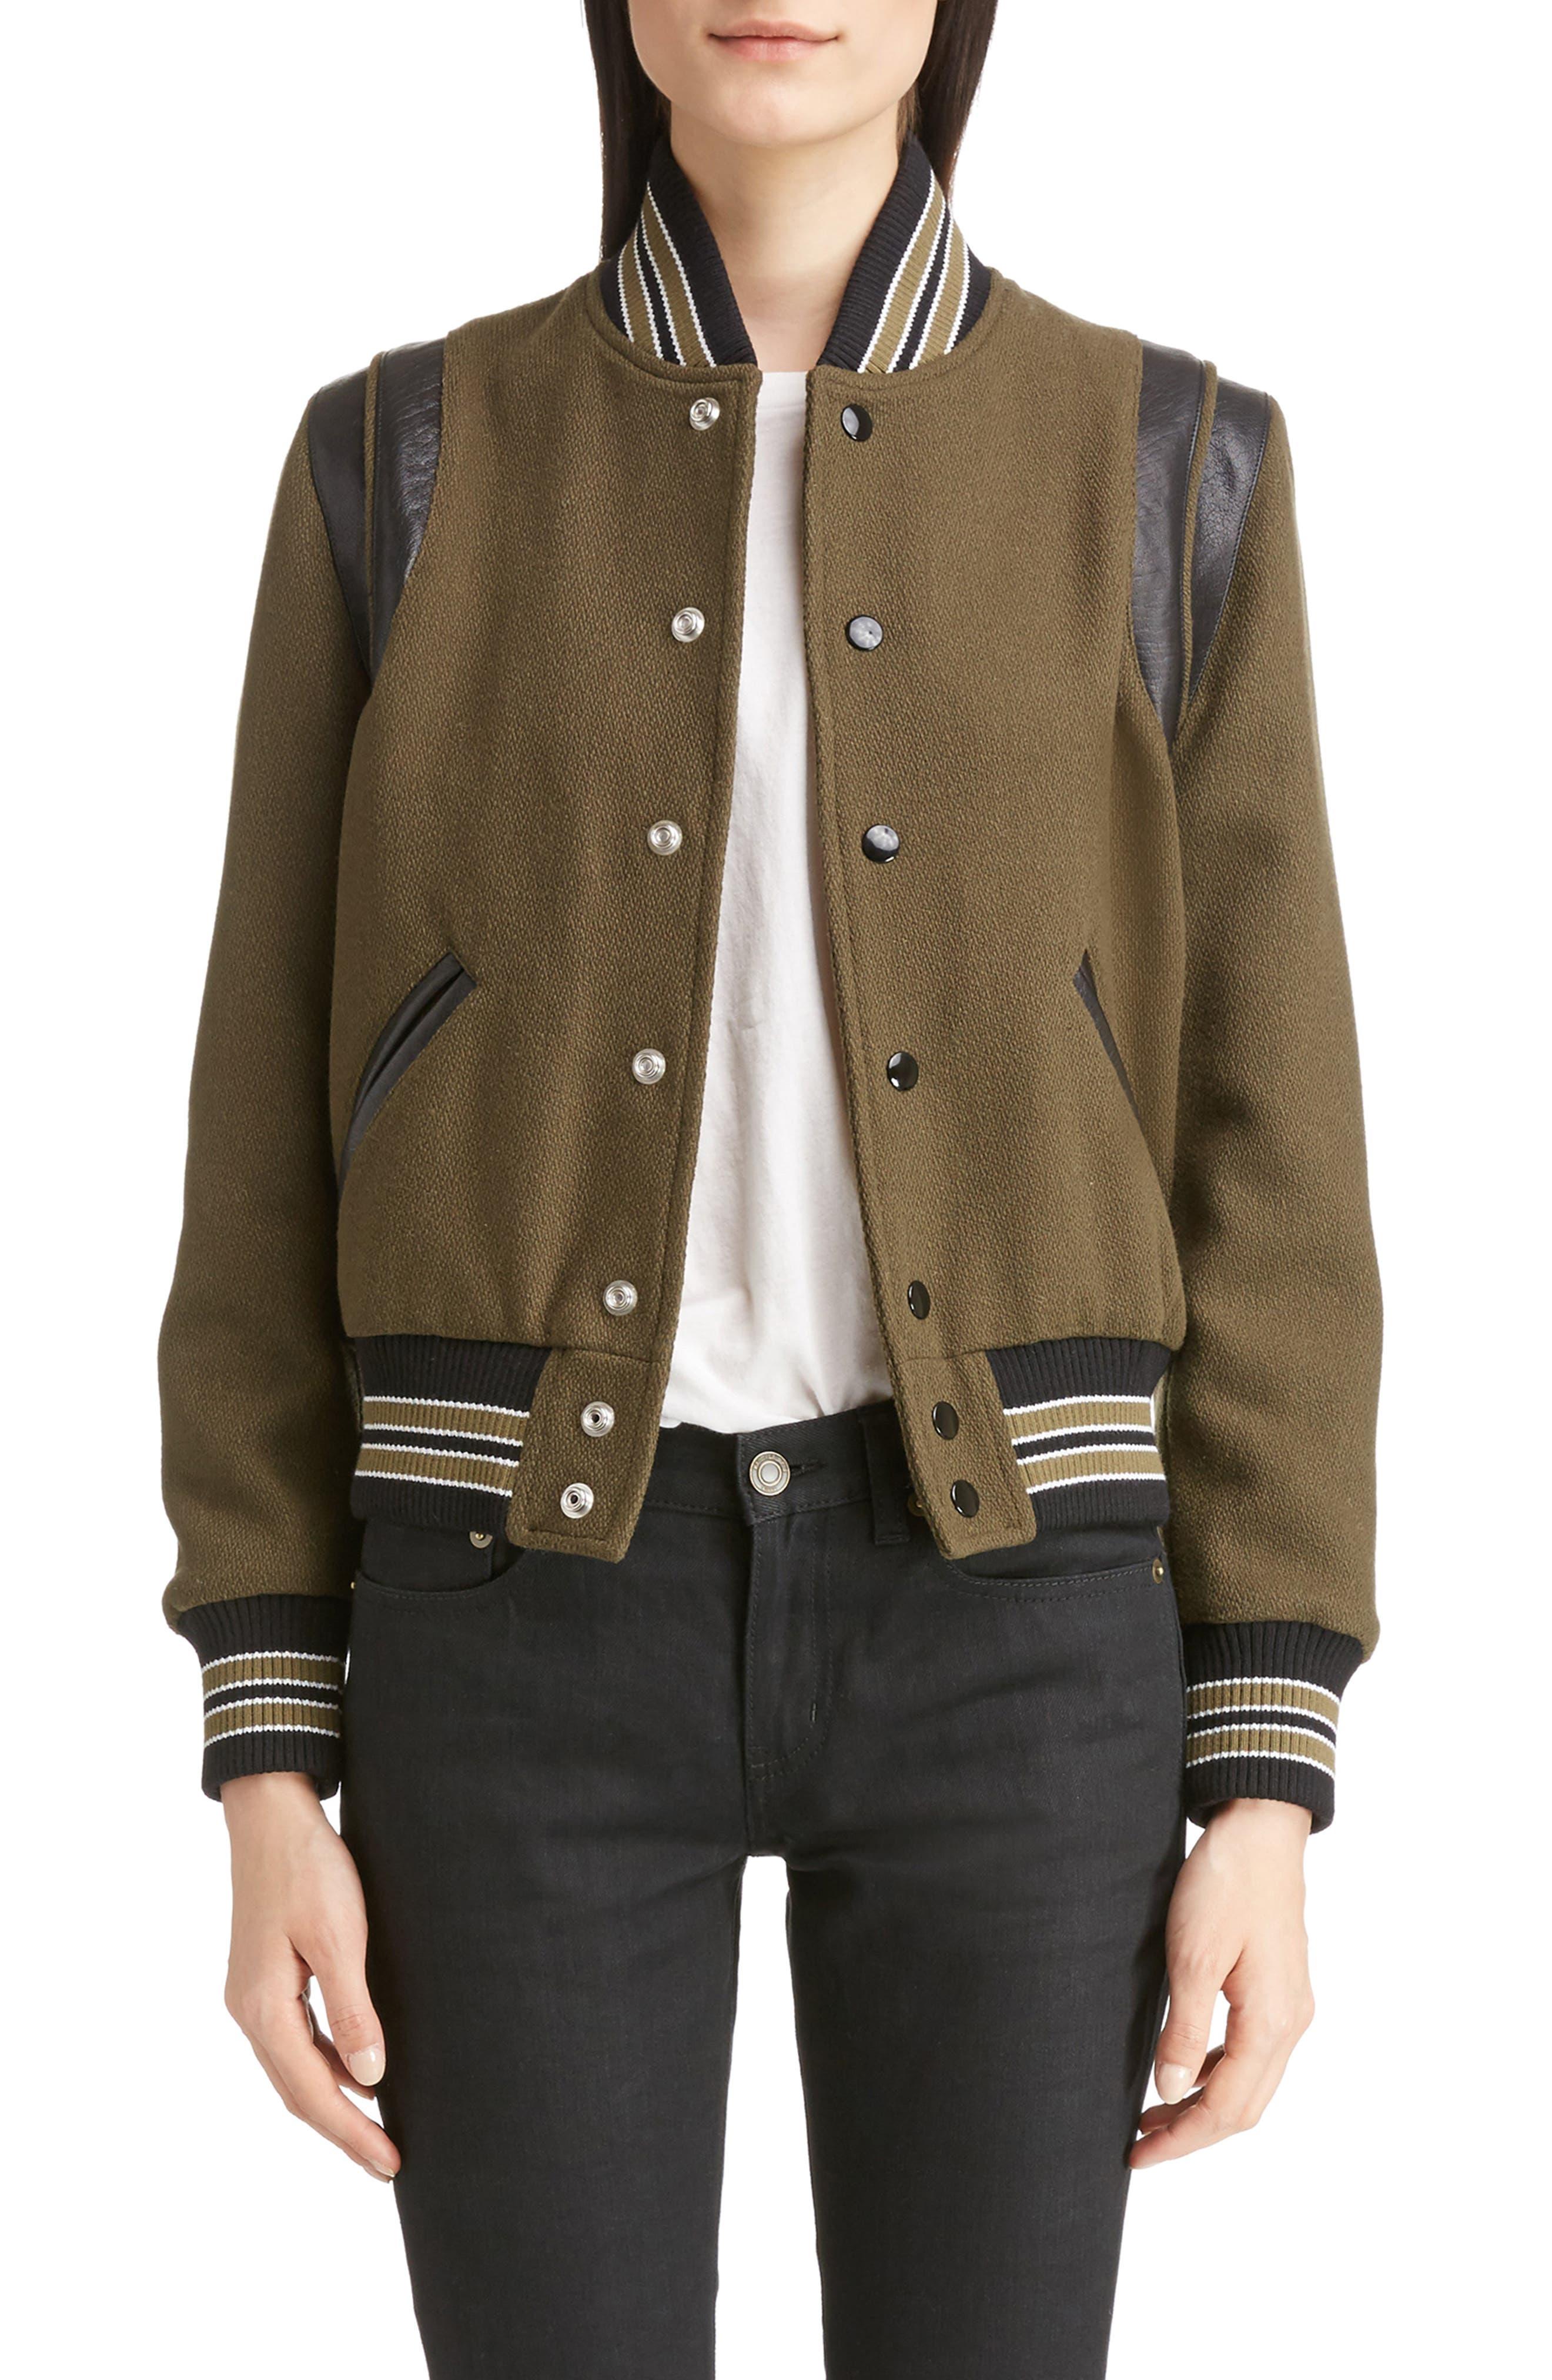 Alternate Image 1 Selected - Saint Laurent Leather Trim Classic Teddy Jacket